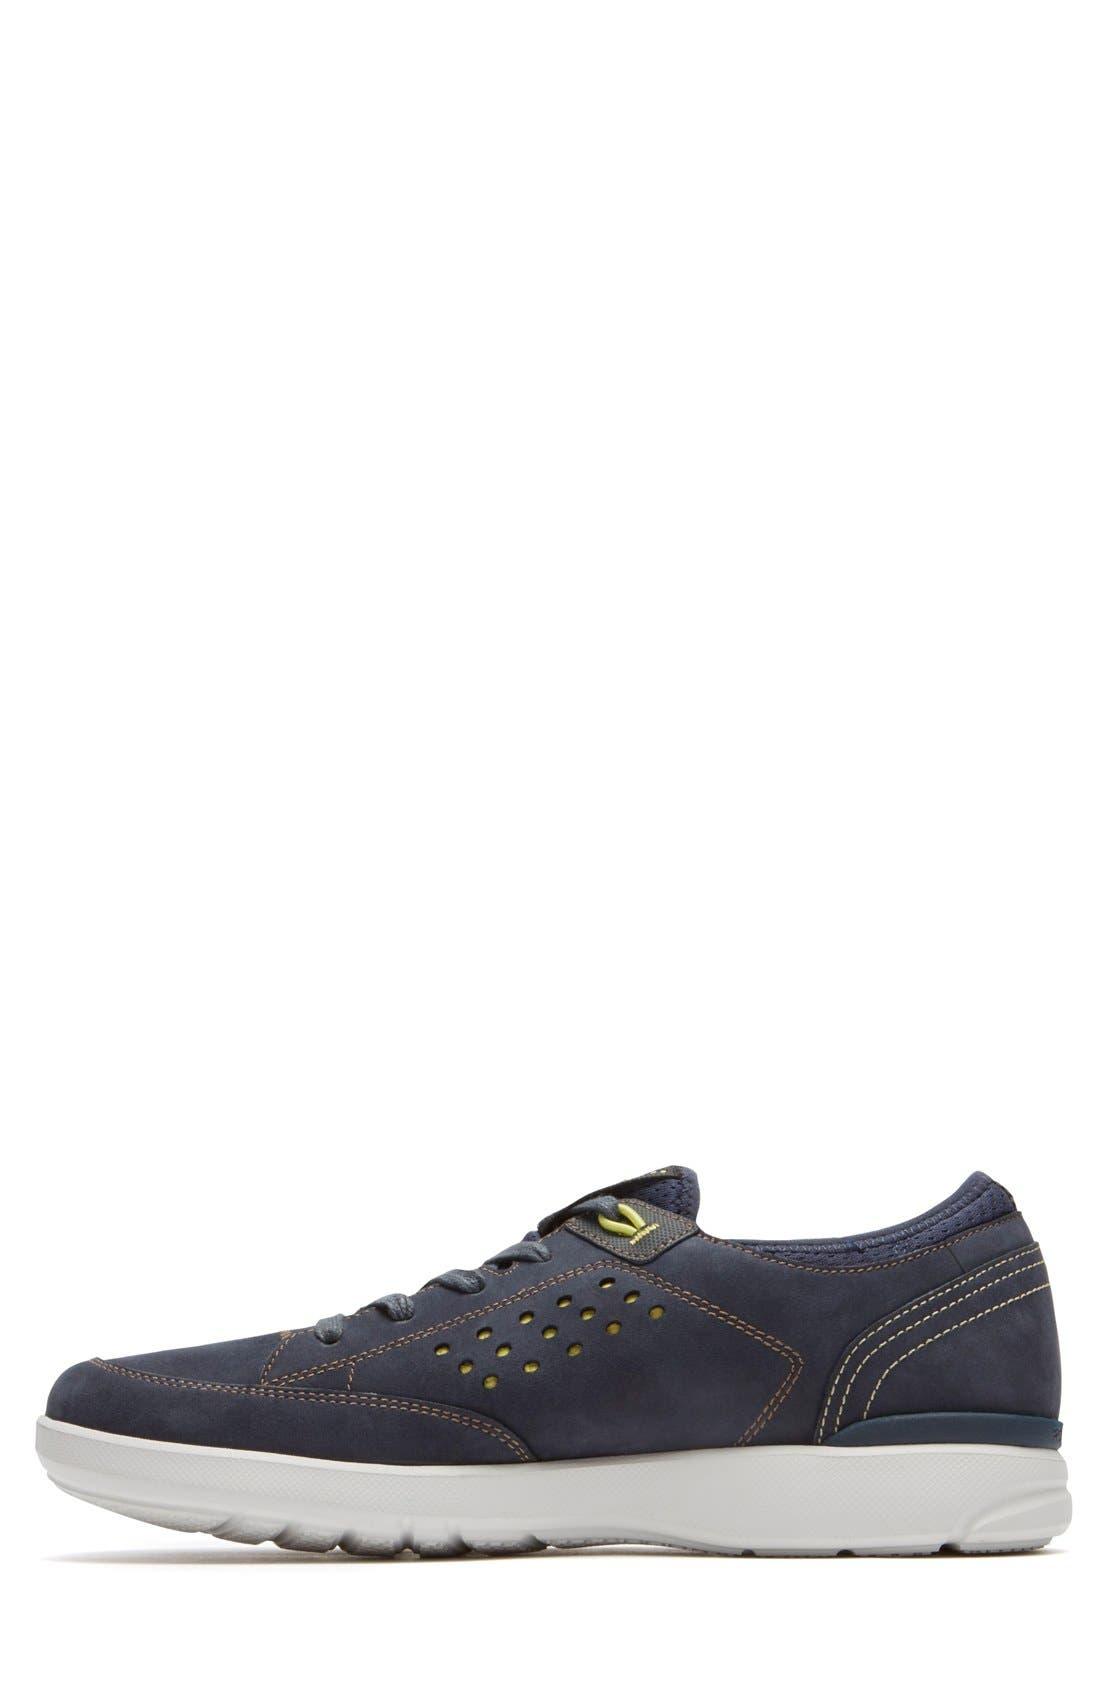 Truflex Sneaker,                             Alternate thumbnail 8, color,                             NEW DRESS BLUES NUBUCK